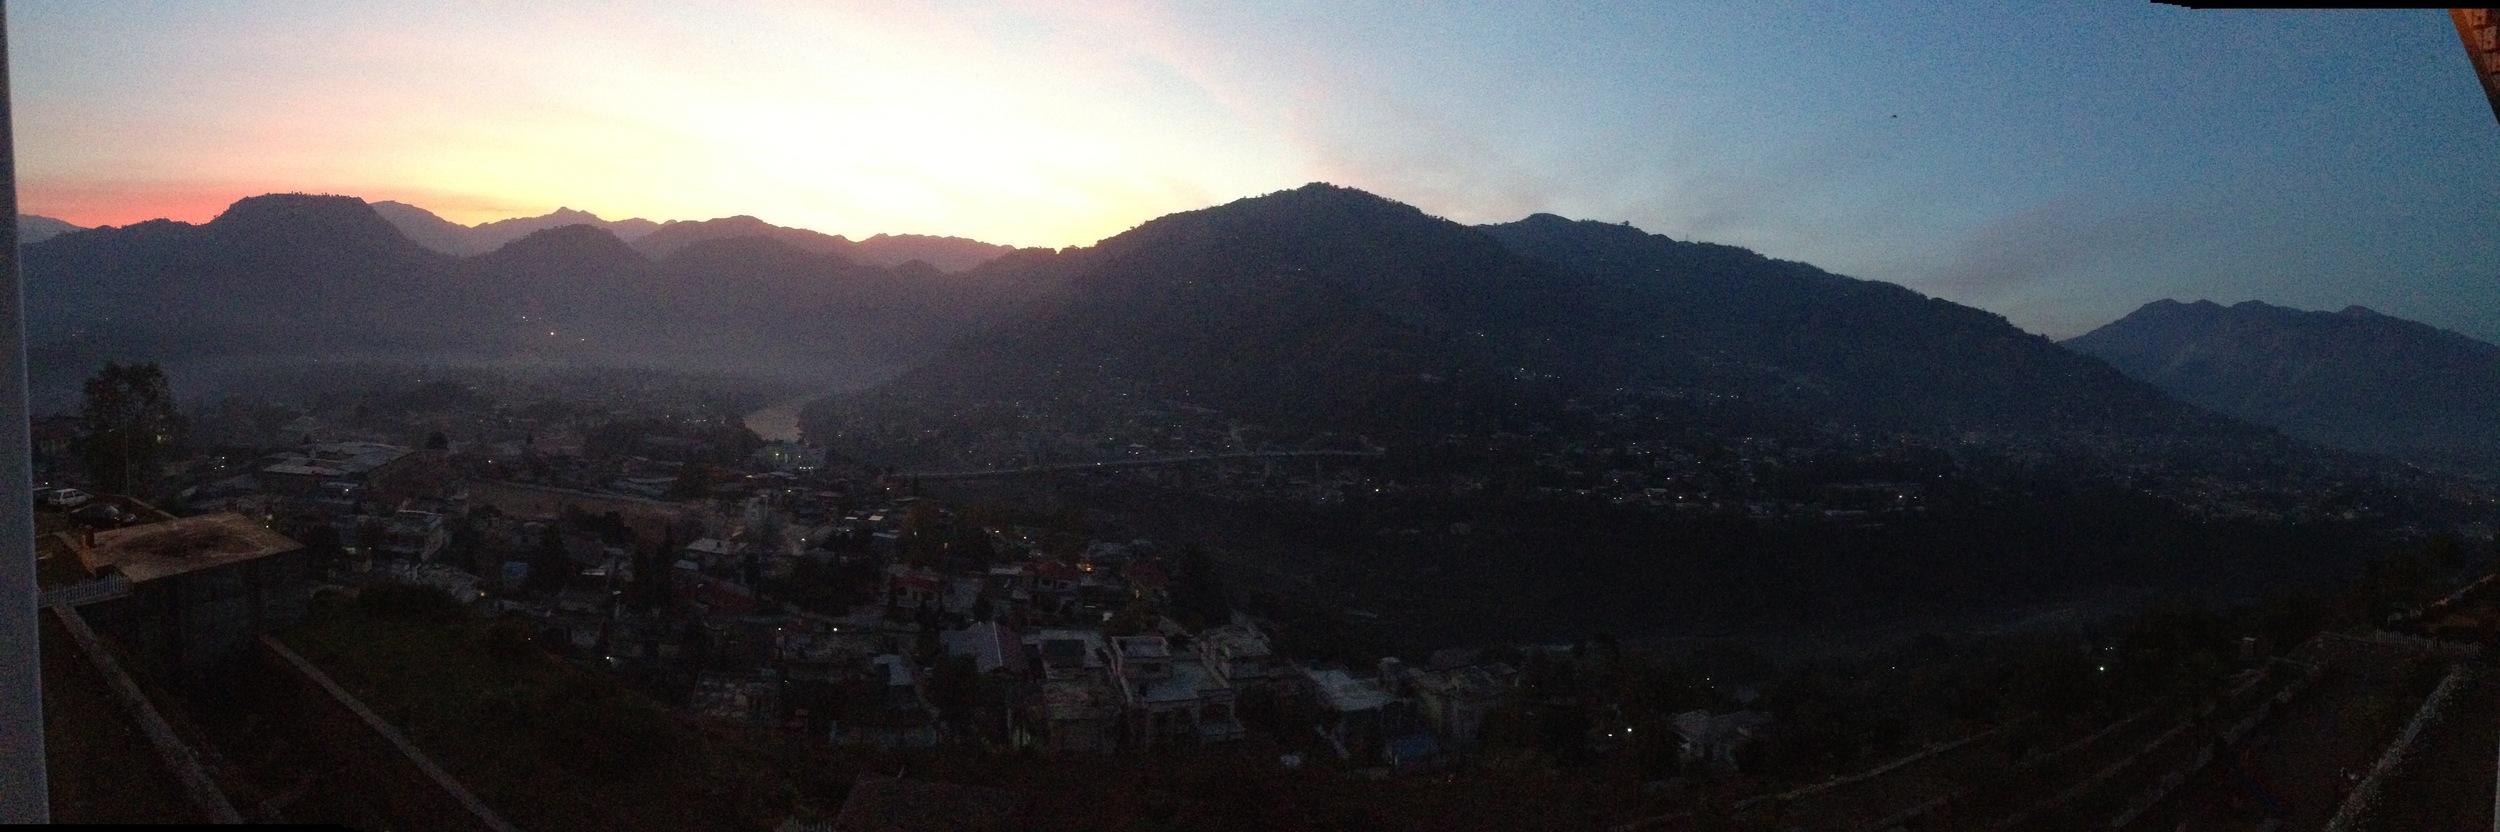 The view of the Muzaffarabad valley from our hotel window (basically all I saw of Muzaffarabad).